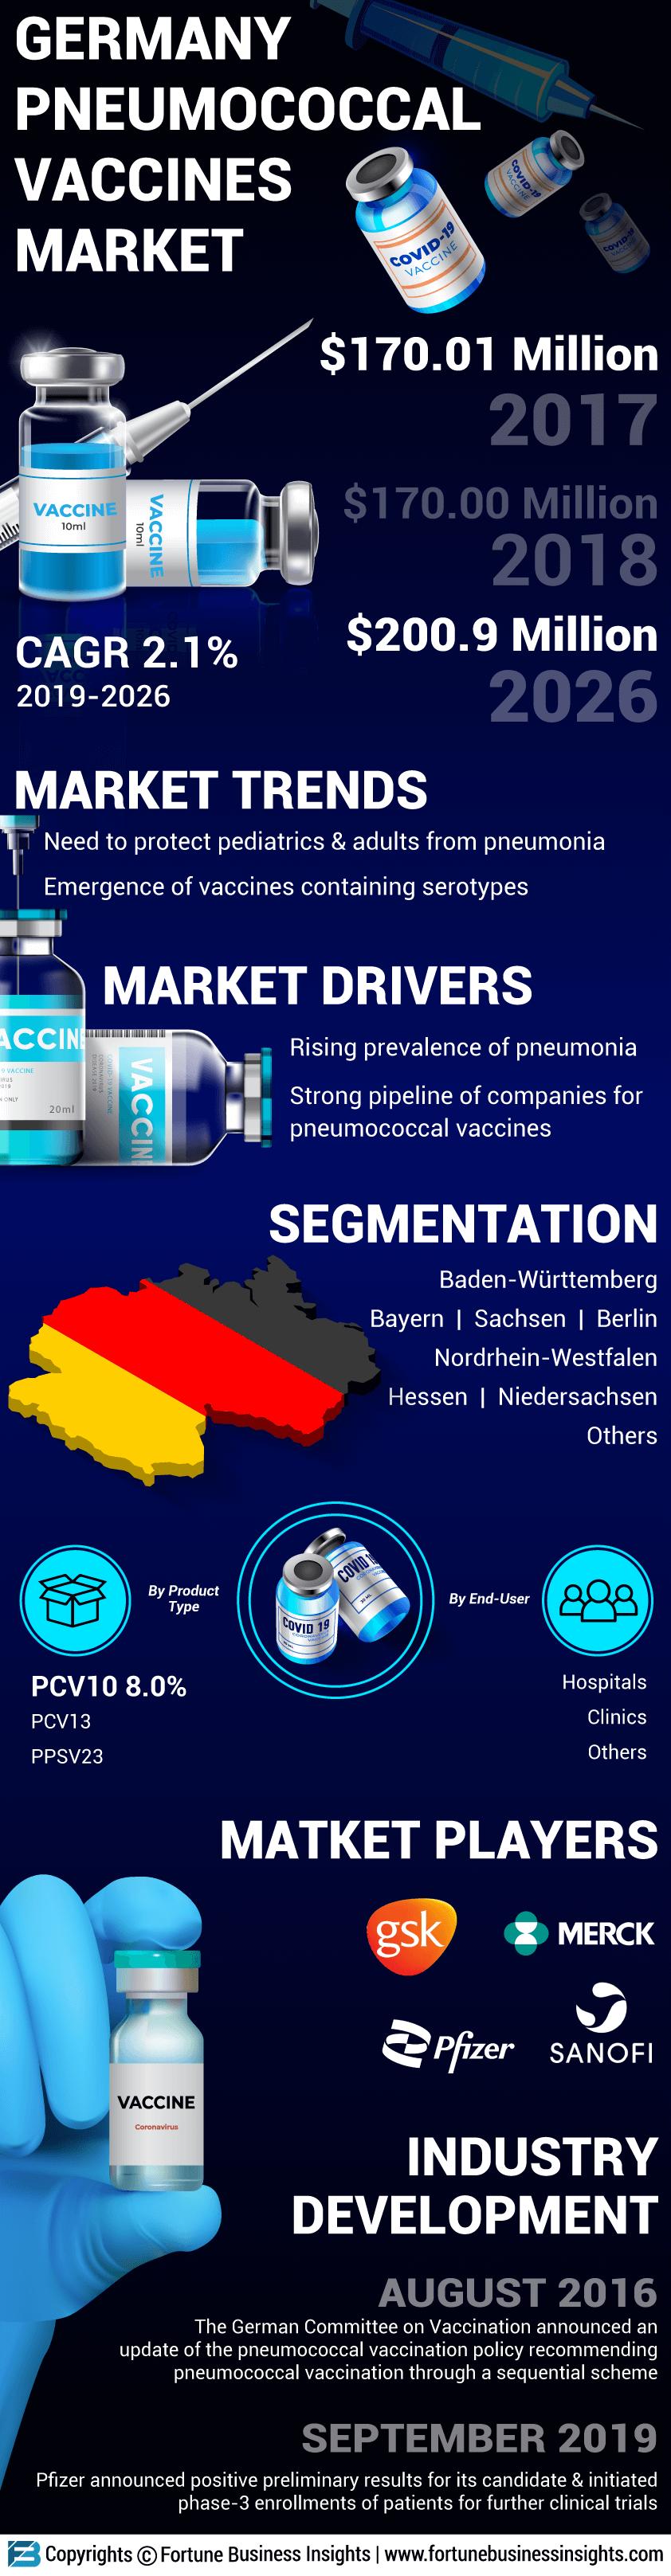 Germany Pneumococcal Vaccines Market